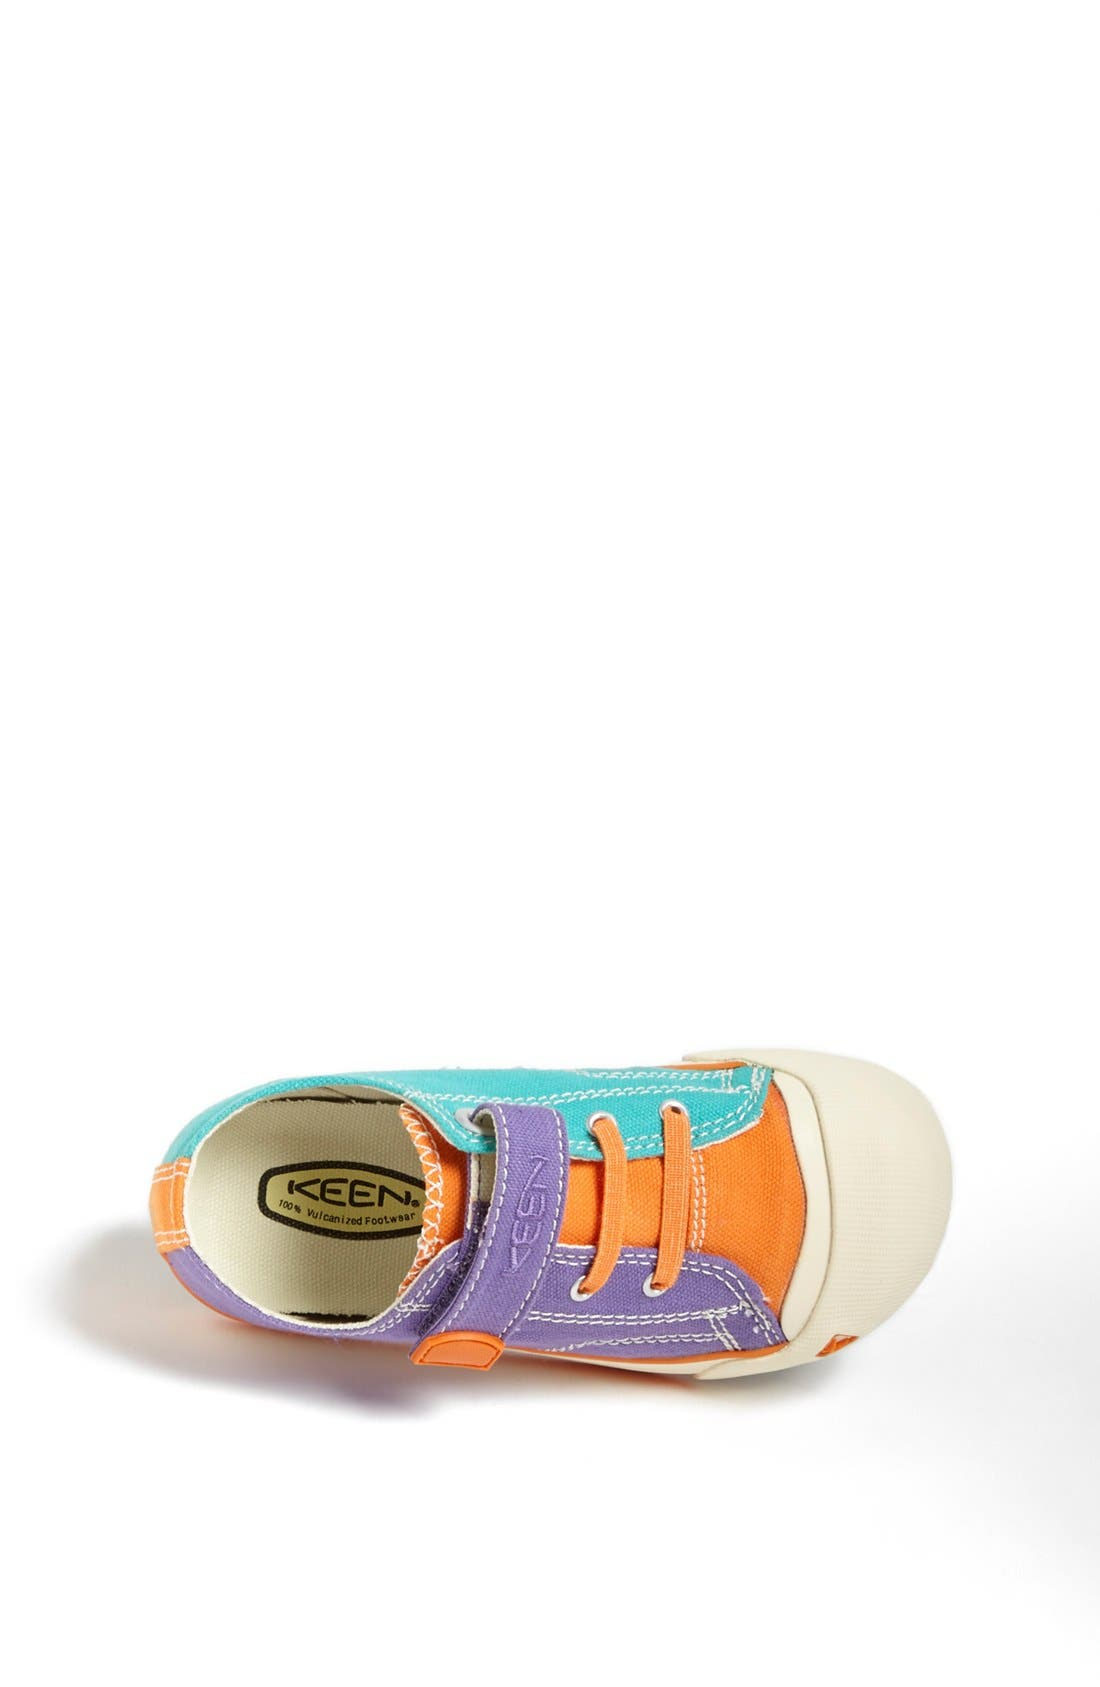 Alternate Image 3  - Keen 'Coronado' Sneaker (Toddler & Little Kid)